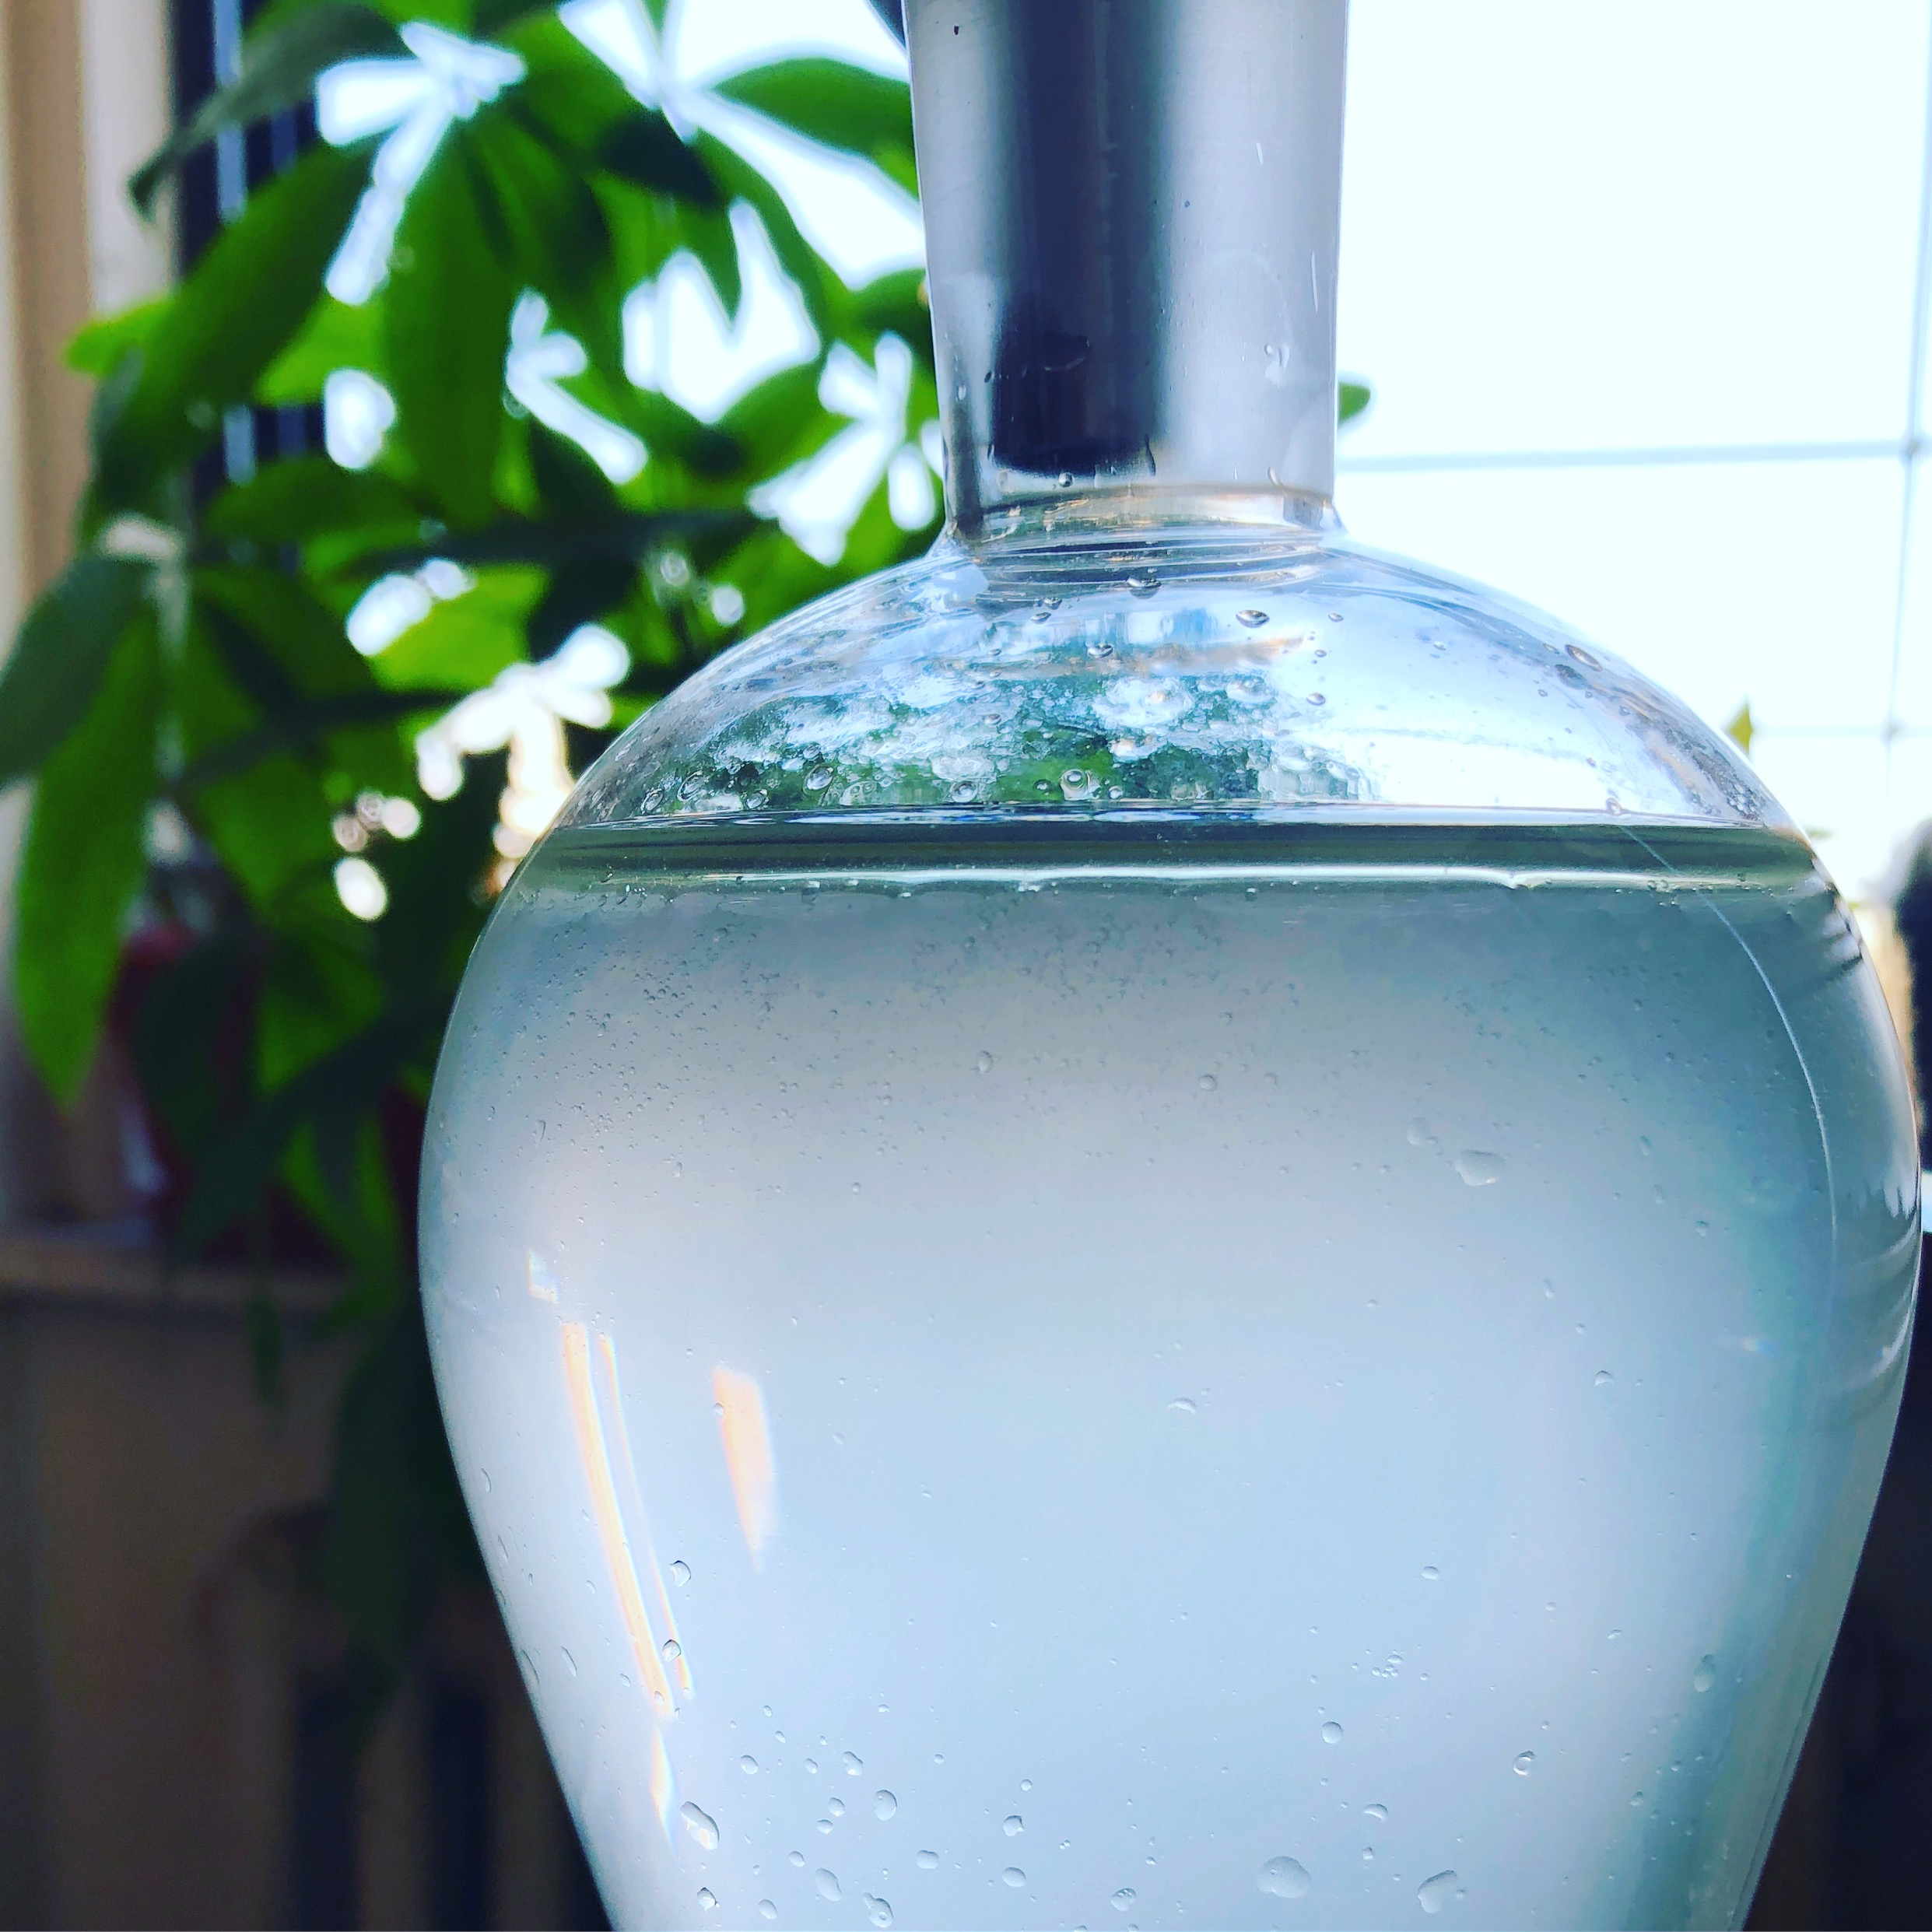 Vibrational AromaWater - 植物の波動が詰まった魔法のアロマ水で植物のエネルギーに触れてみませんか?